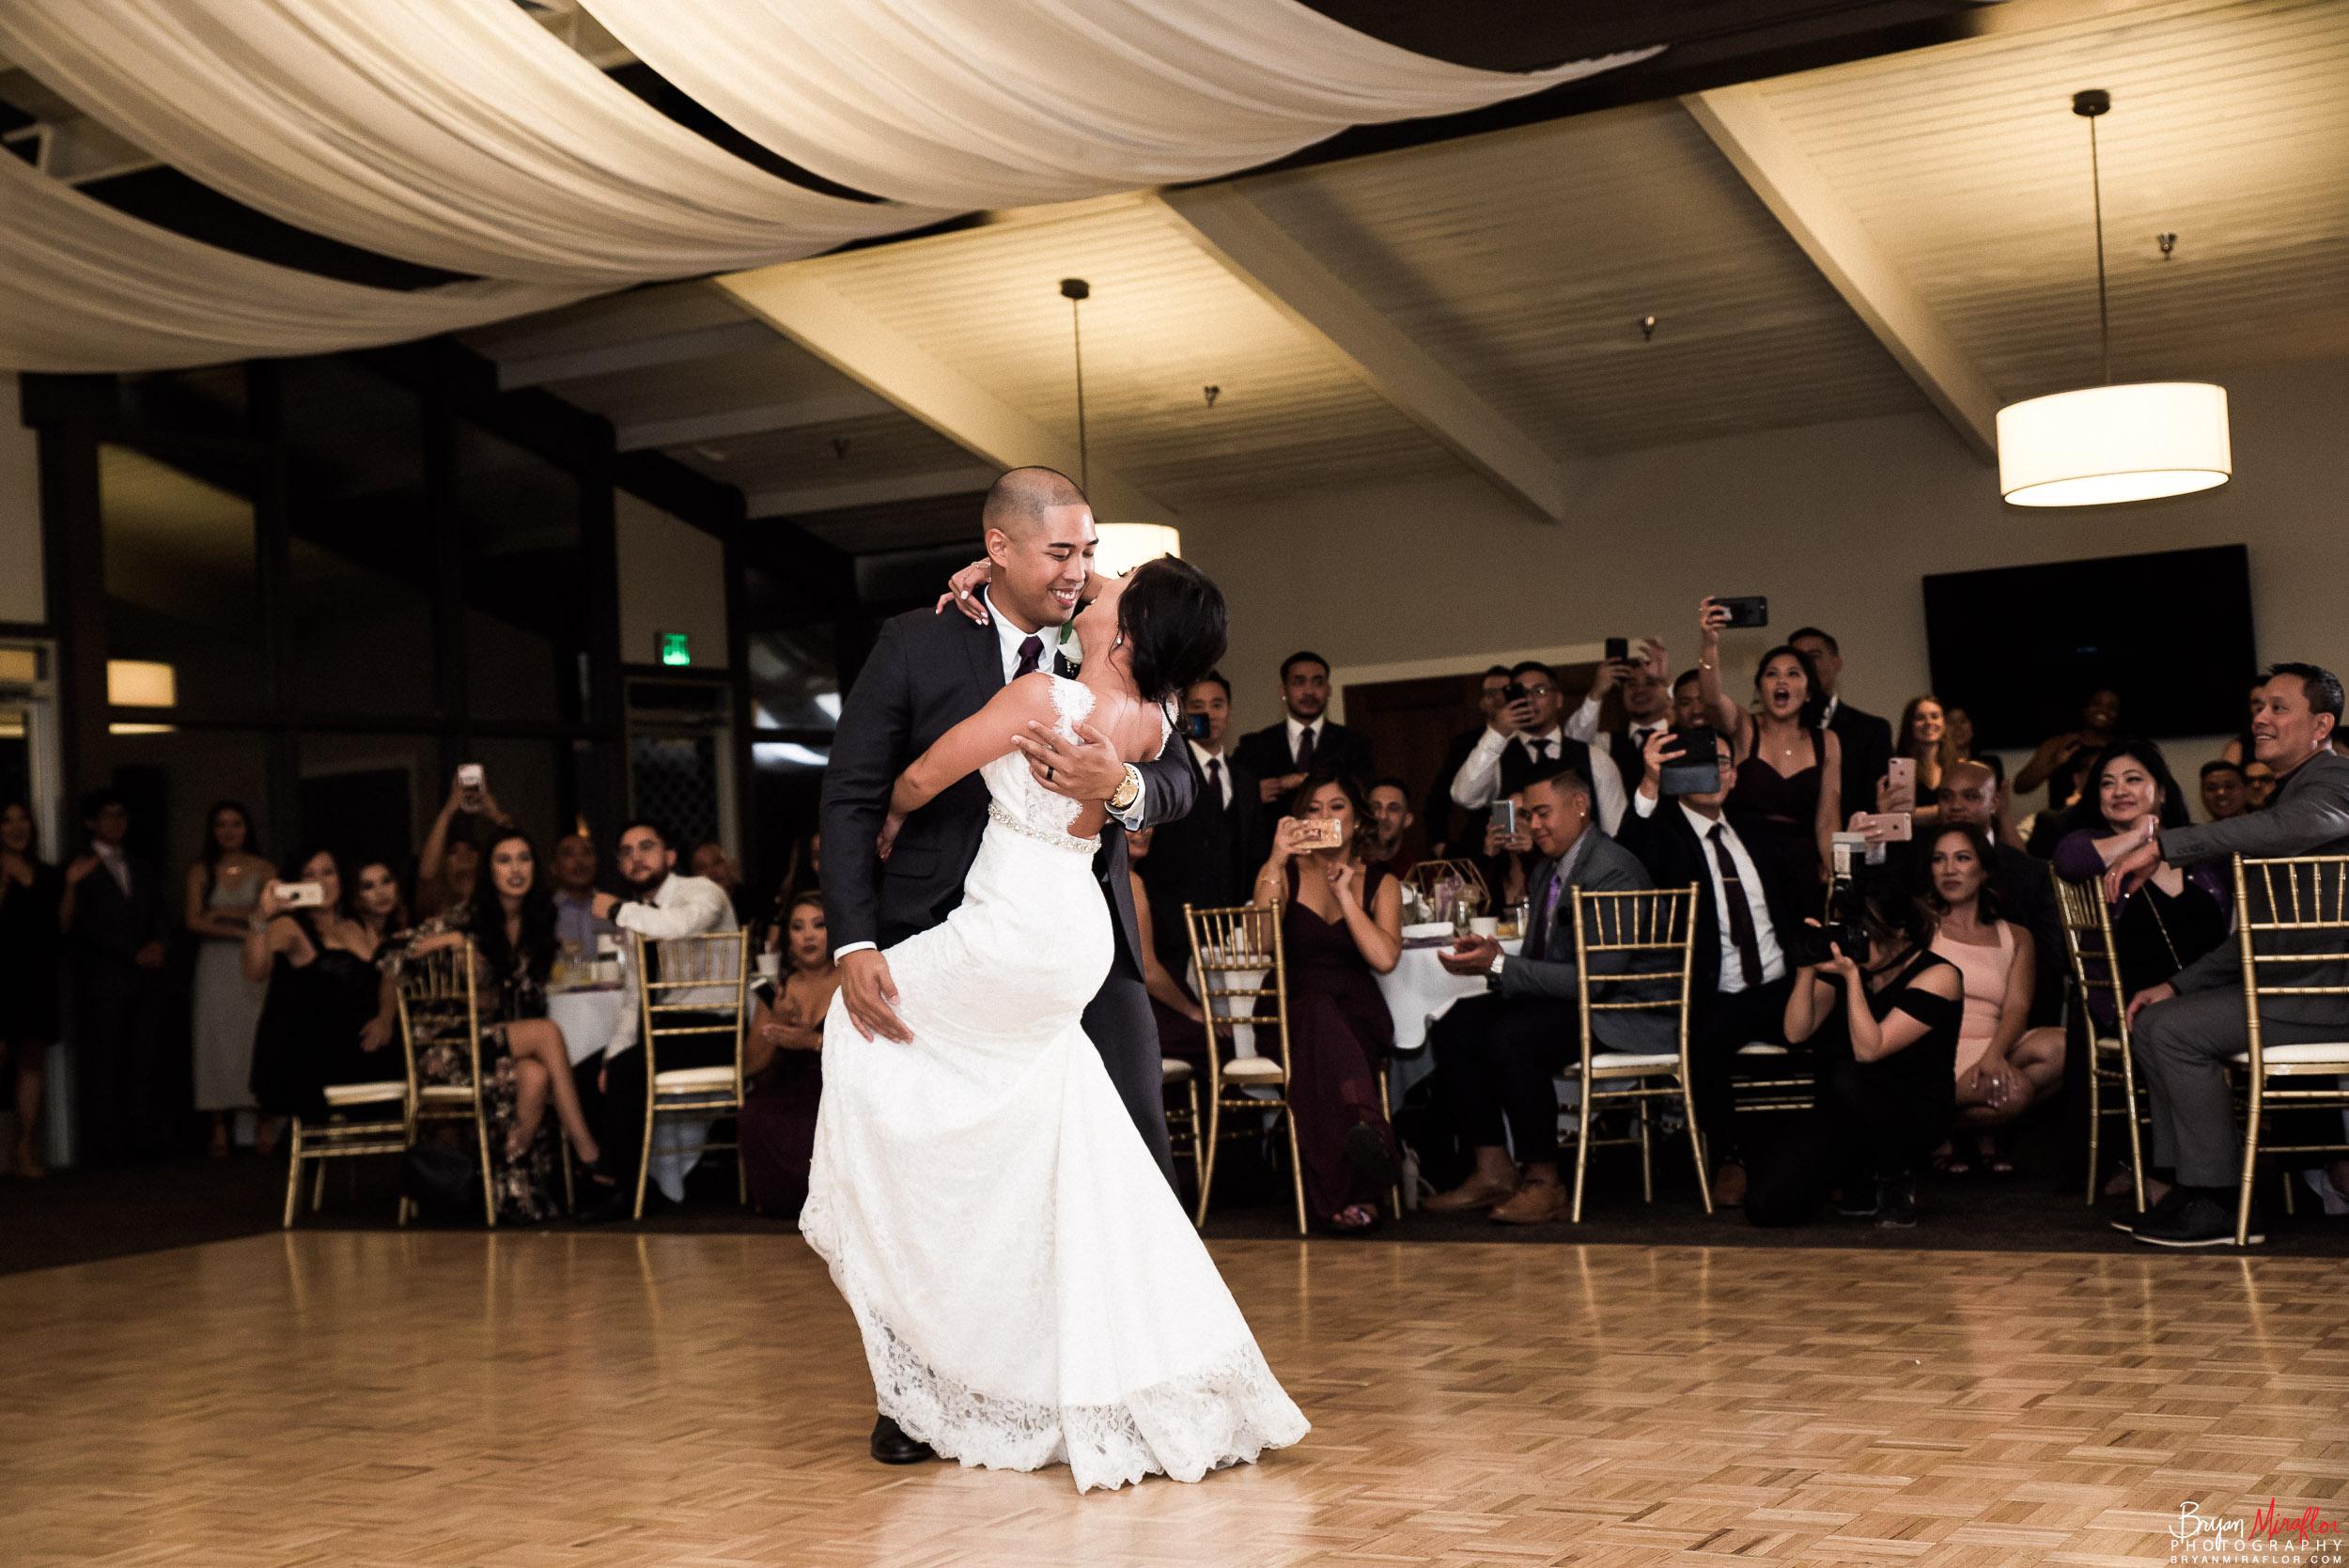 Bryan-Miraflor-Photography-Trisha-Dexter-Married-20170923-070.jpg